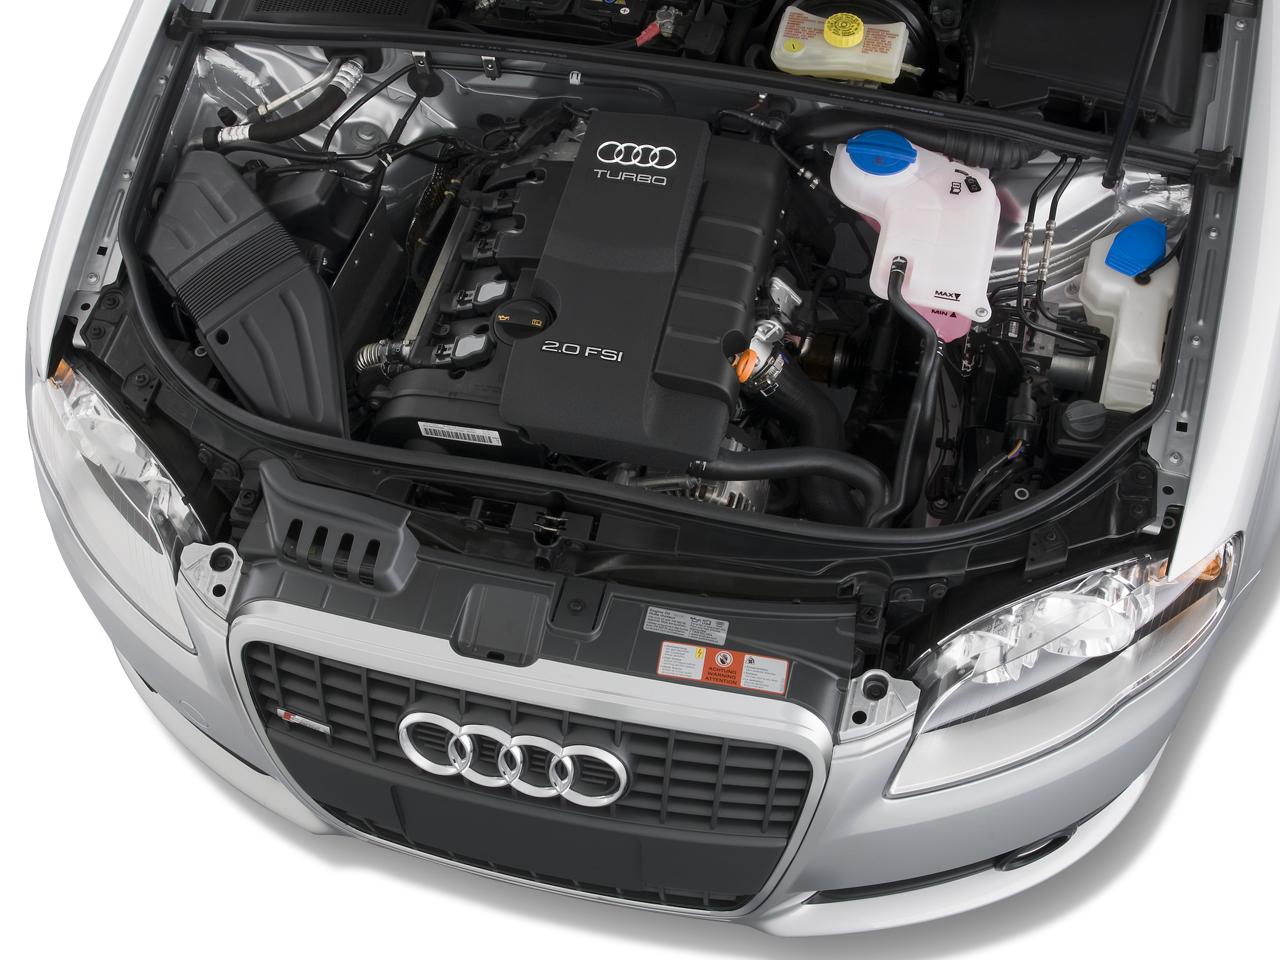 2008 Audi A4 Cabriolet Adriatic Odyssey Latest News